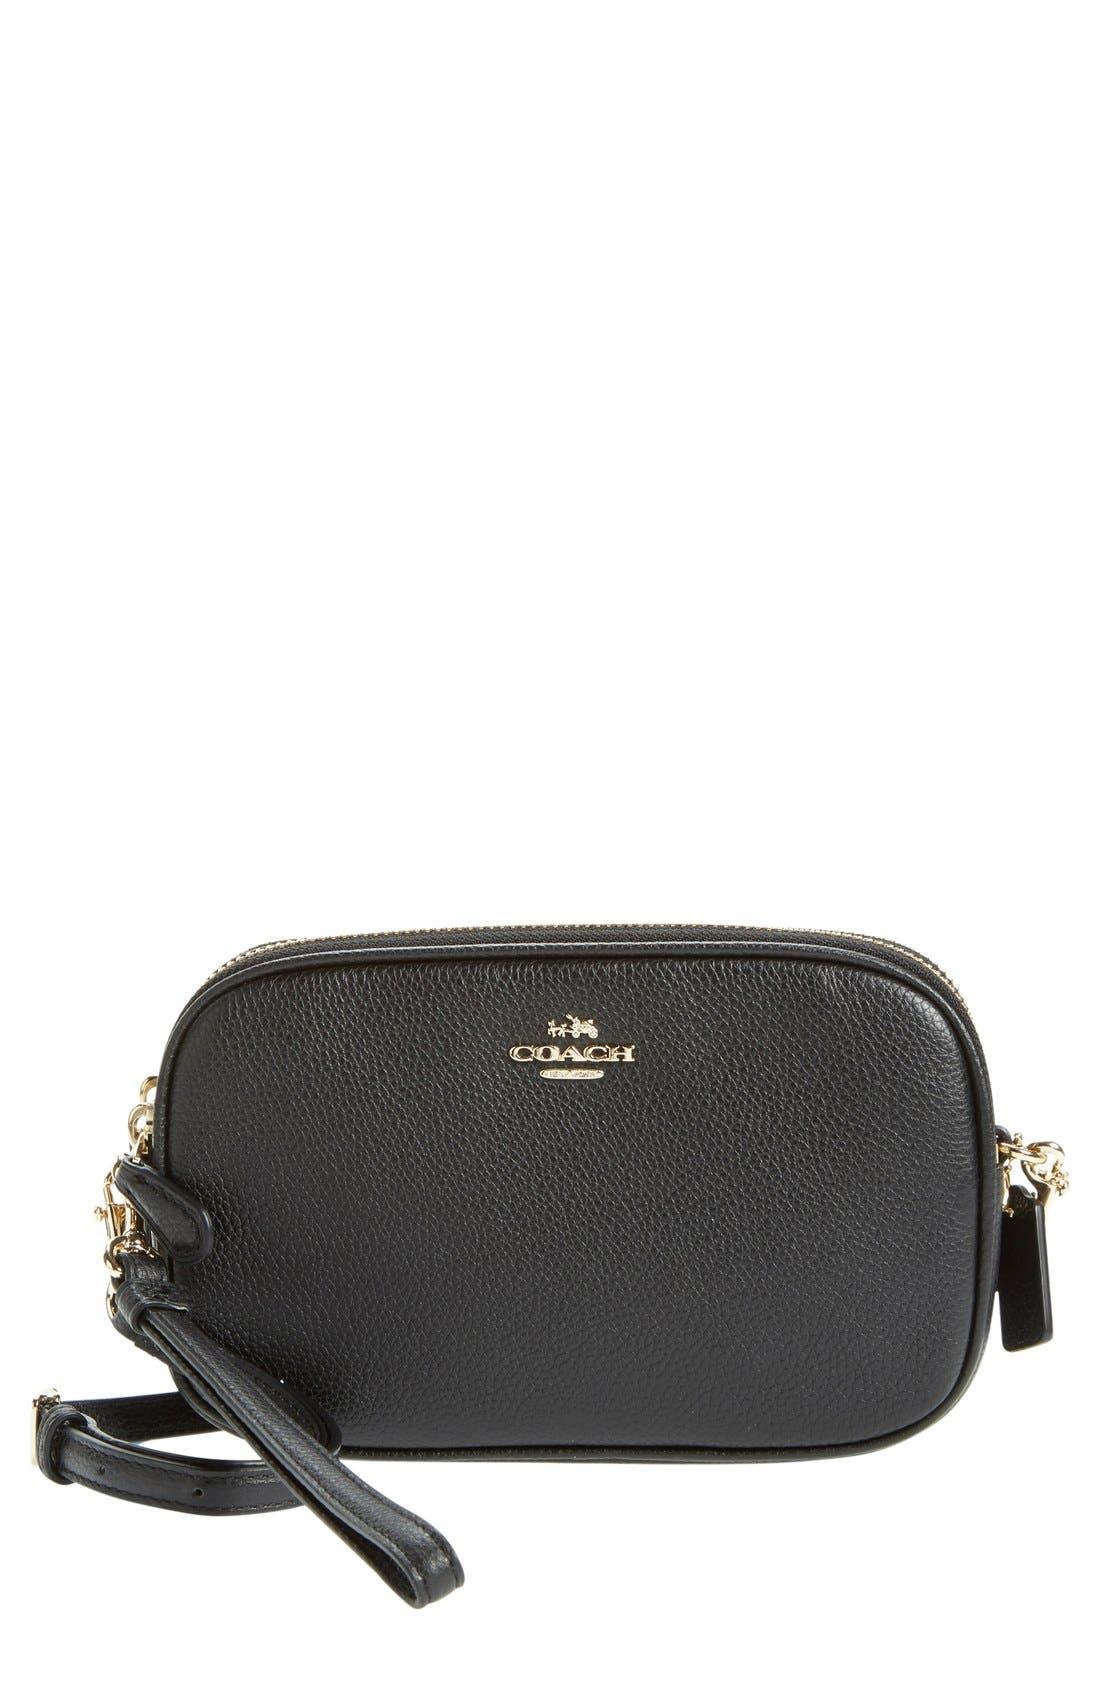 Convertible Leather Crossbody Bag,                             Main thumbnail 1, color,                             001